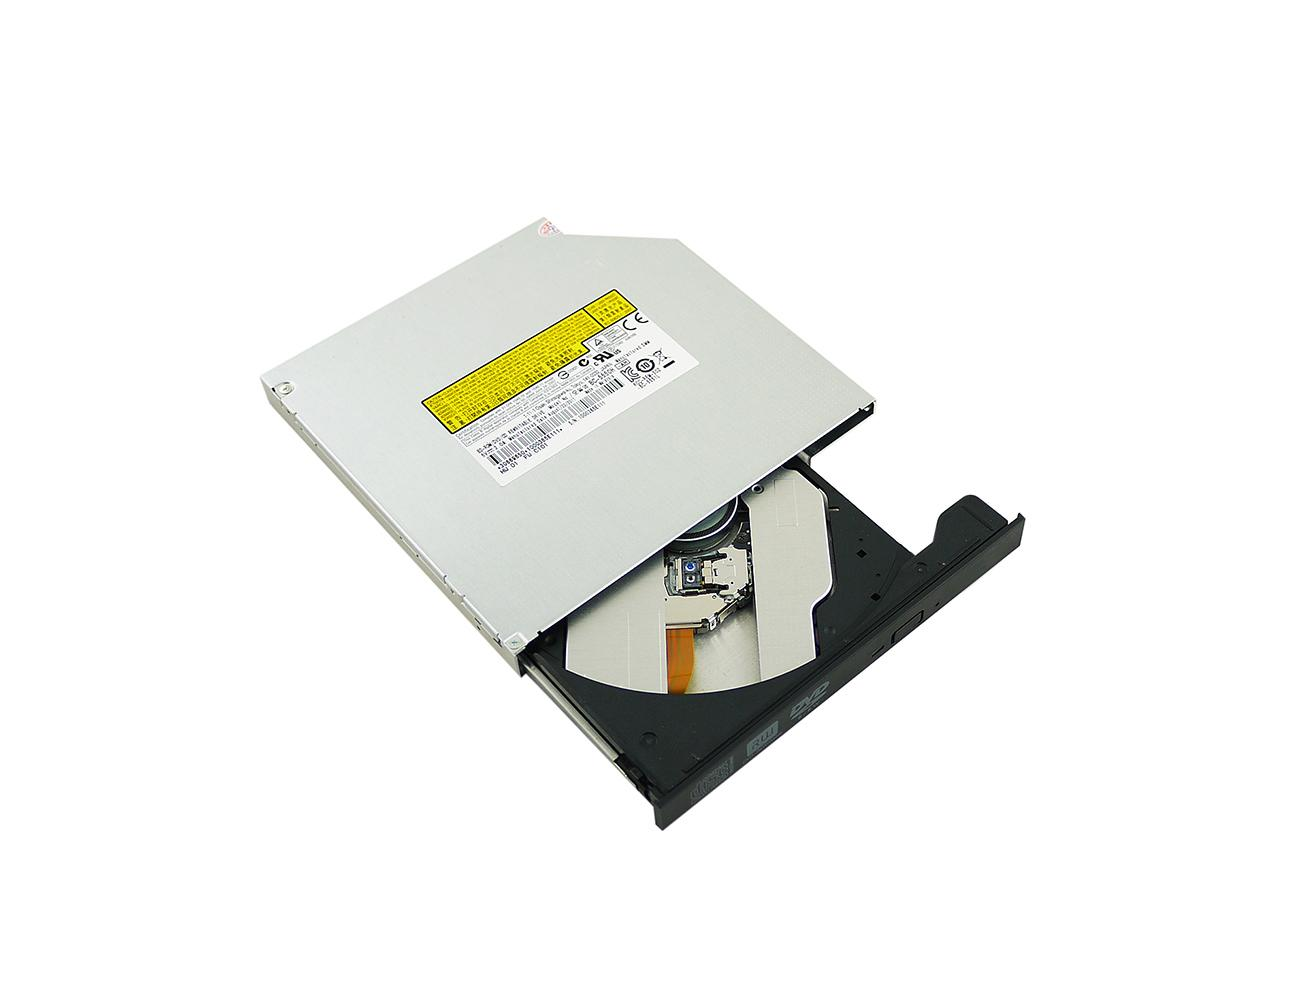 Driver tsstcorp cd dvdw ts-l632d ata device download